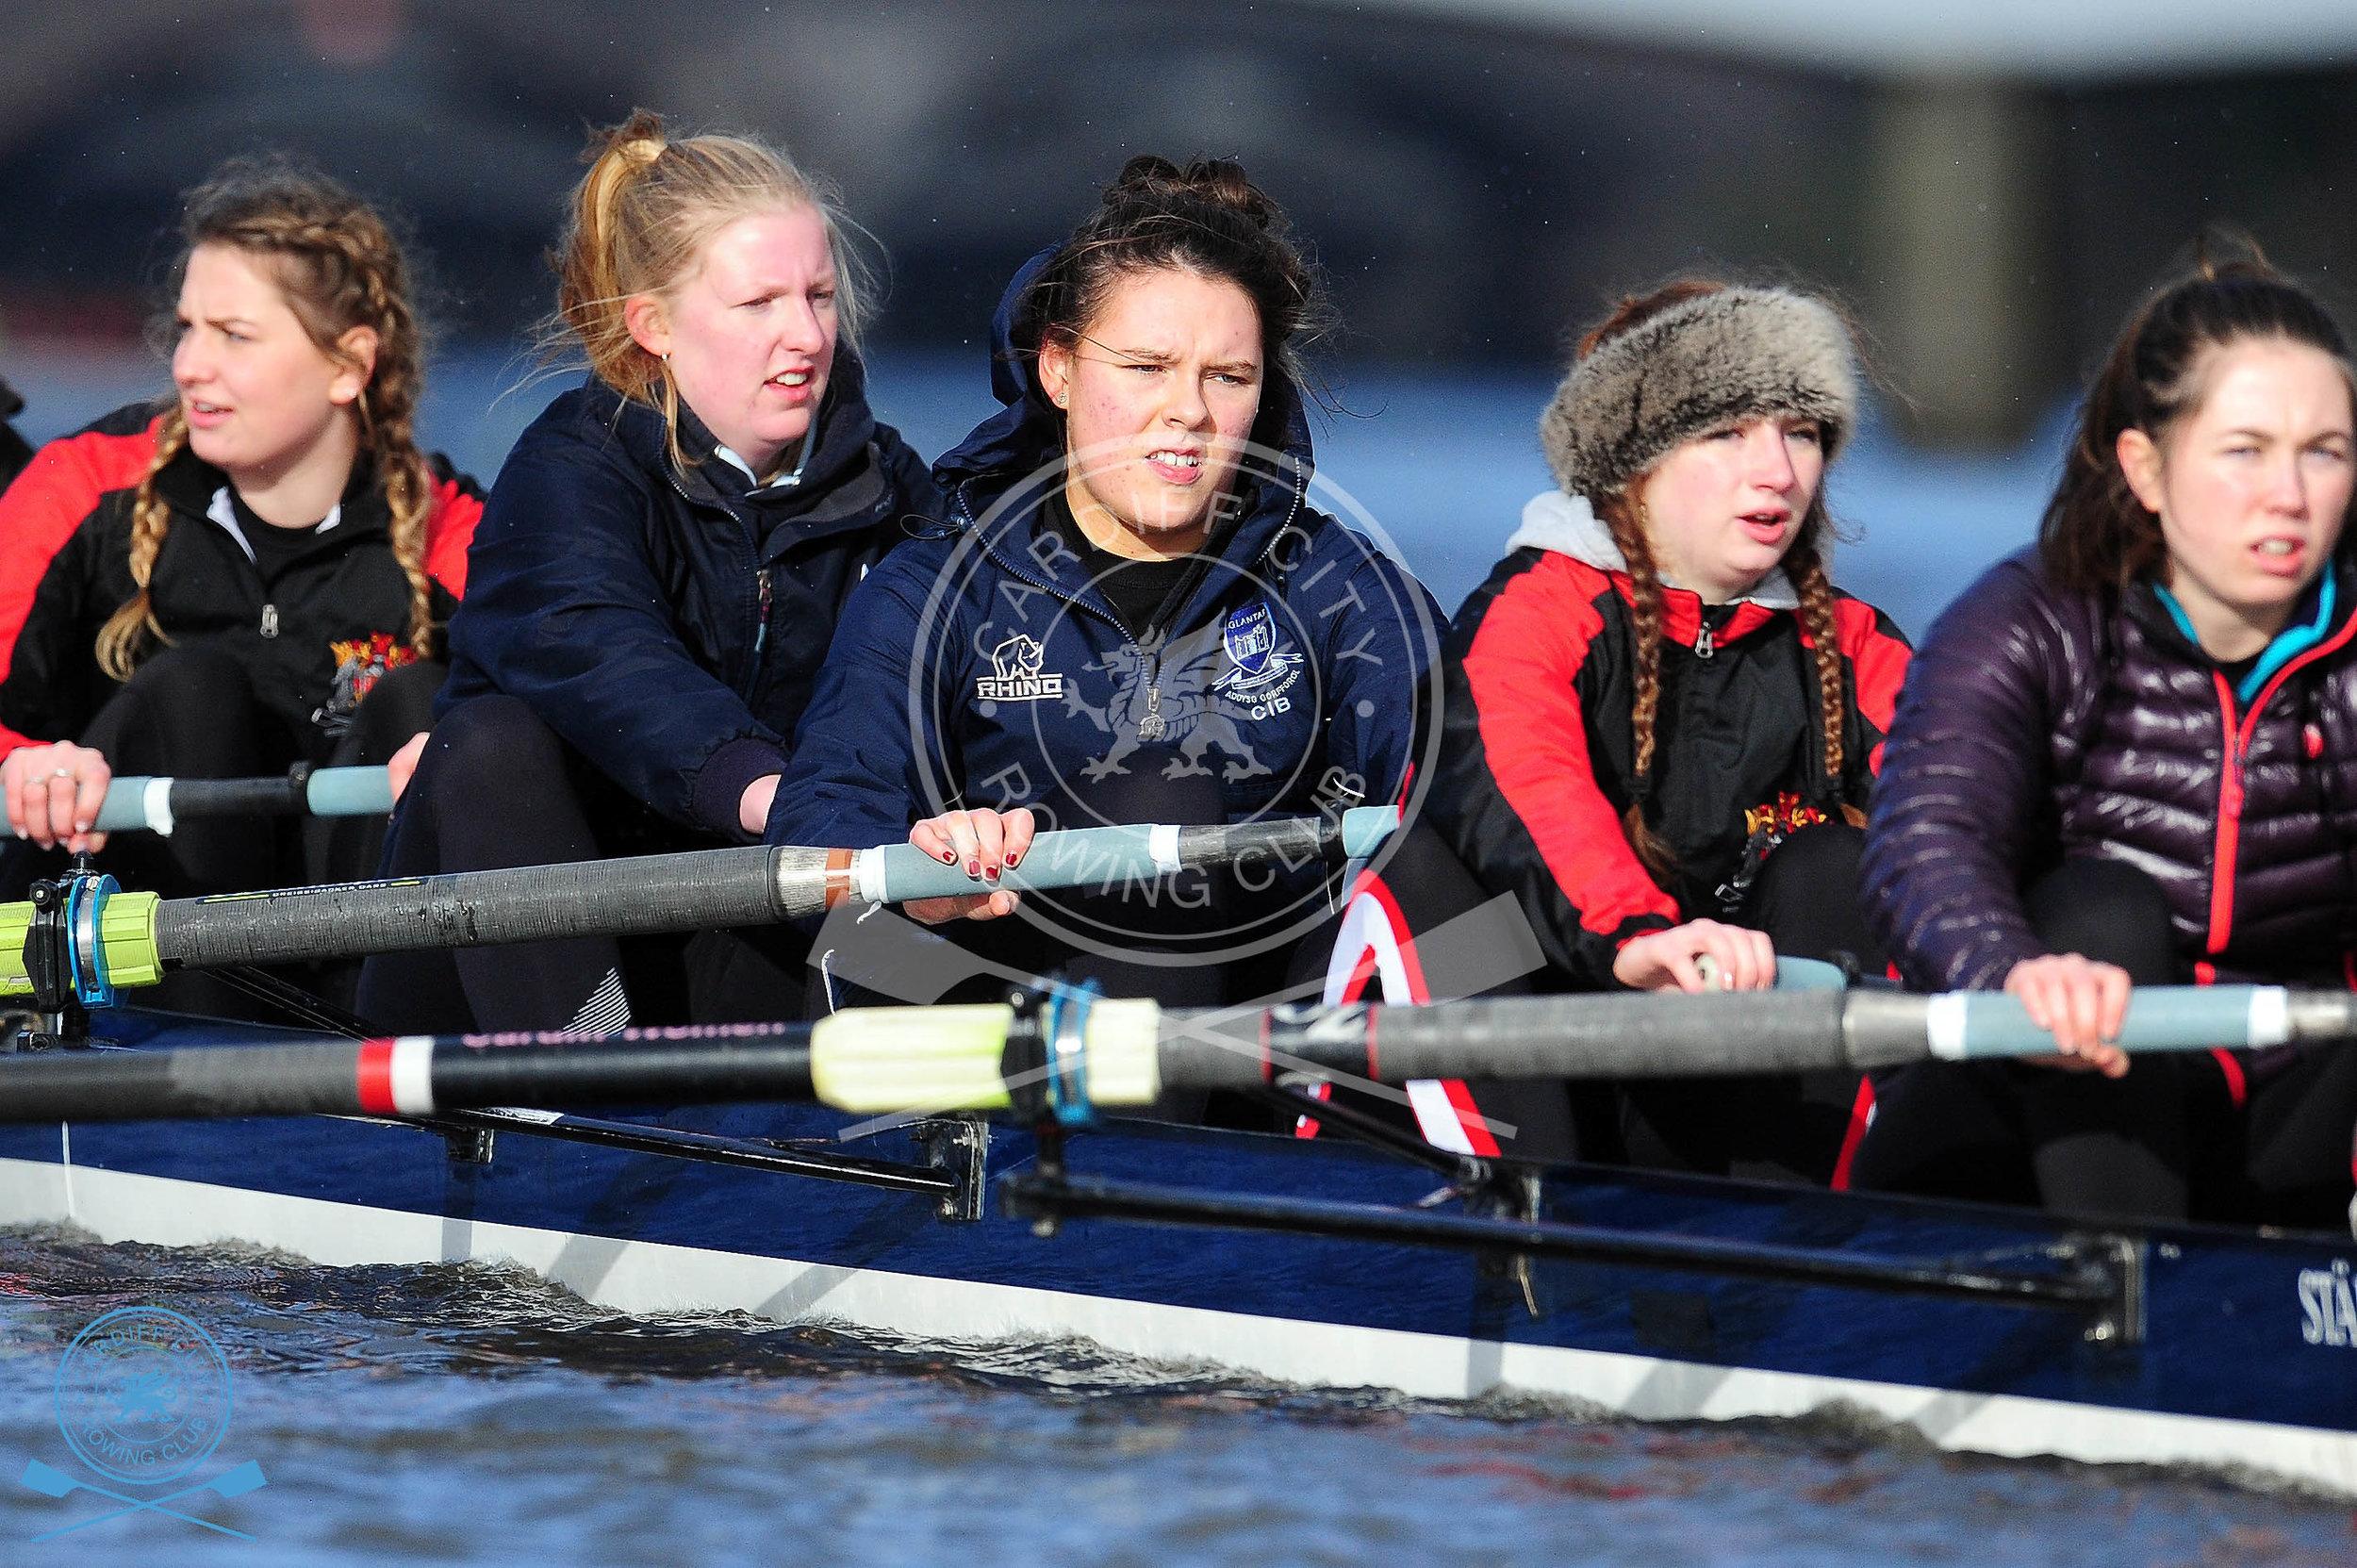 DW_280119_Cardiff_City_Rowing_207.jpg